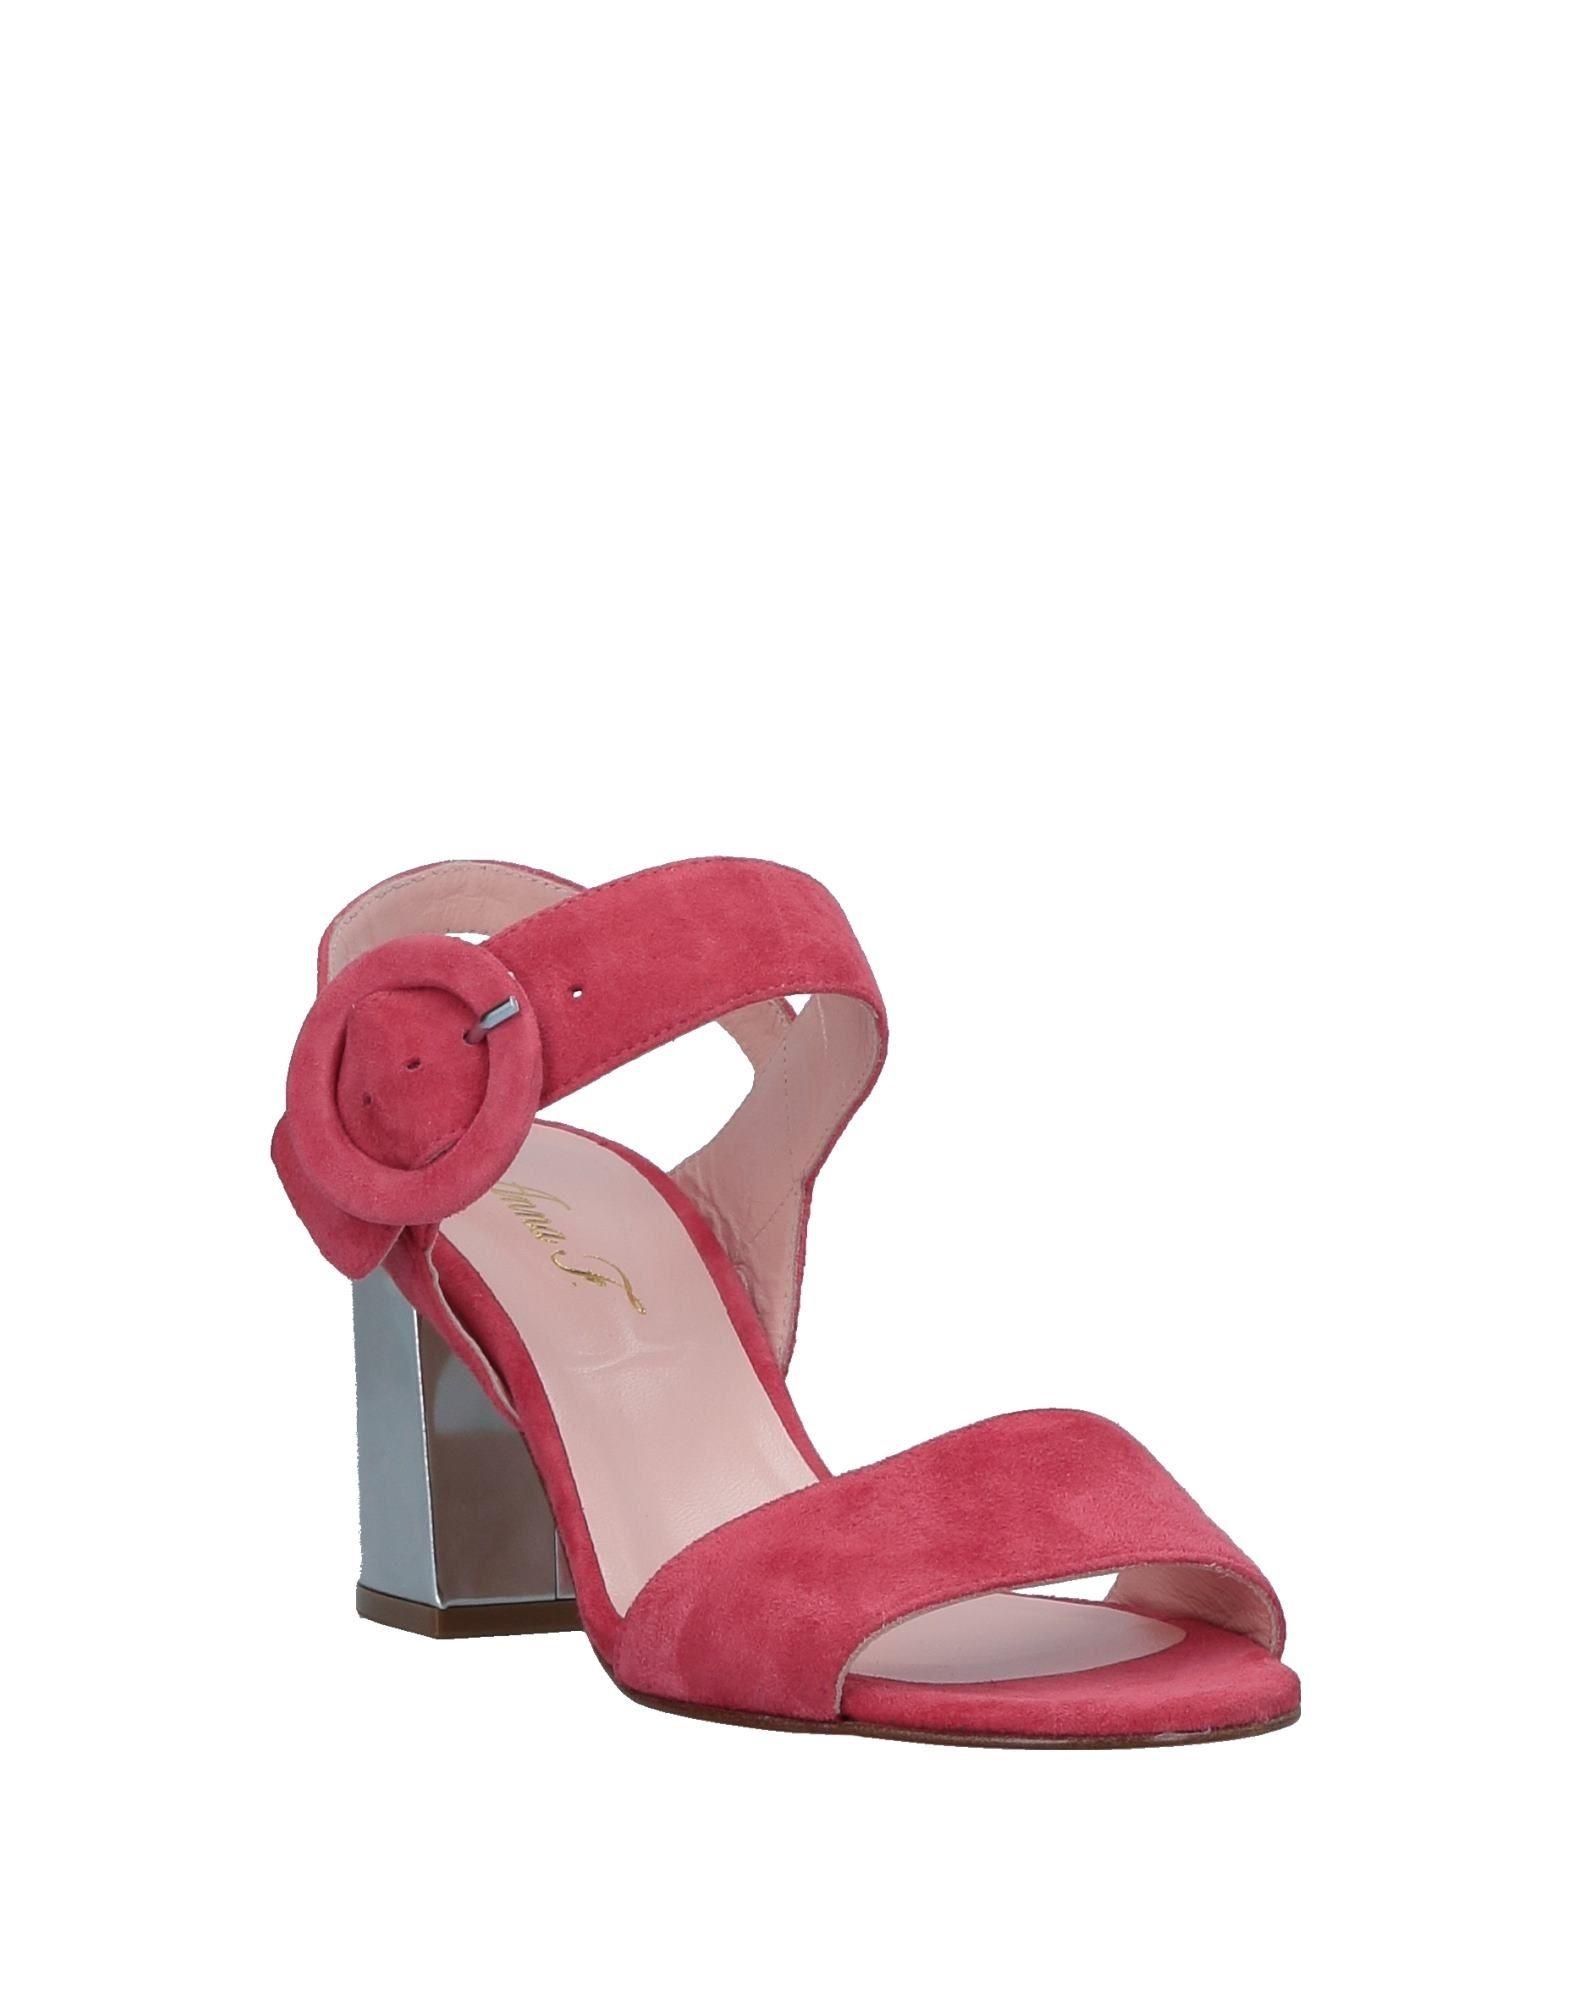 Anna F. Sandalen Damen    11527998PV Gute Qualität beliebte Schuhe 6121f1